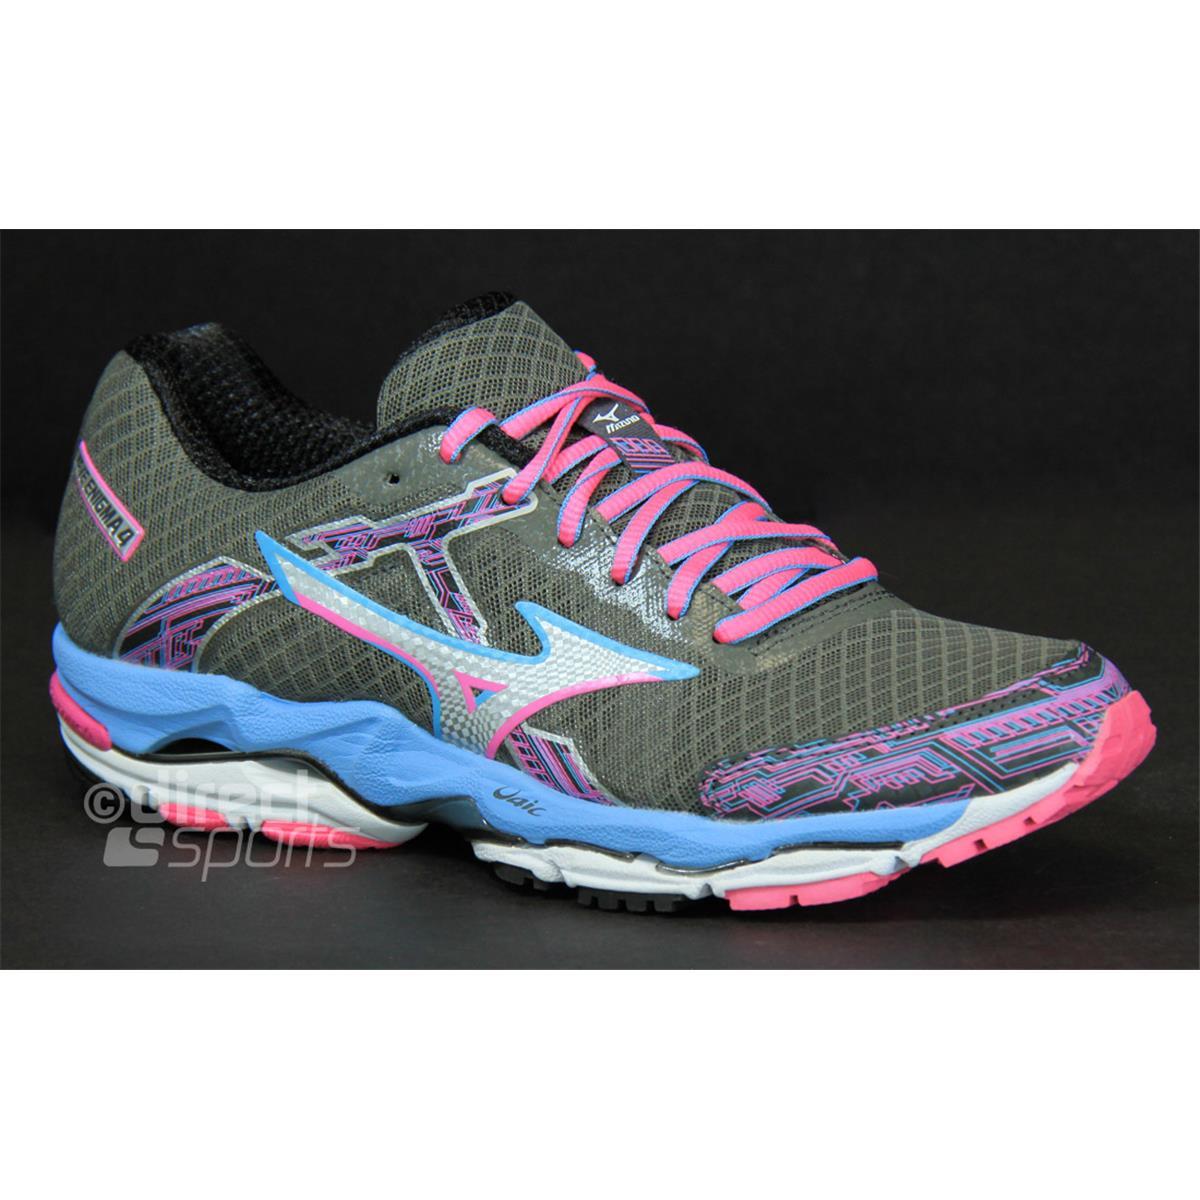 090726e437 Mizuno Wave Enigma 4 Womens Running Shoes (Gunmetal-Silver-Alaskan Blue) (